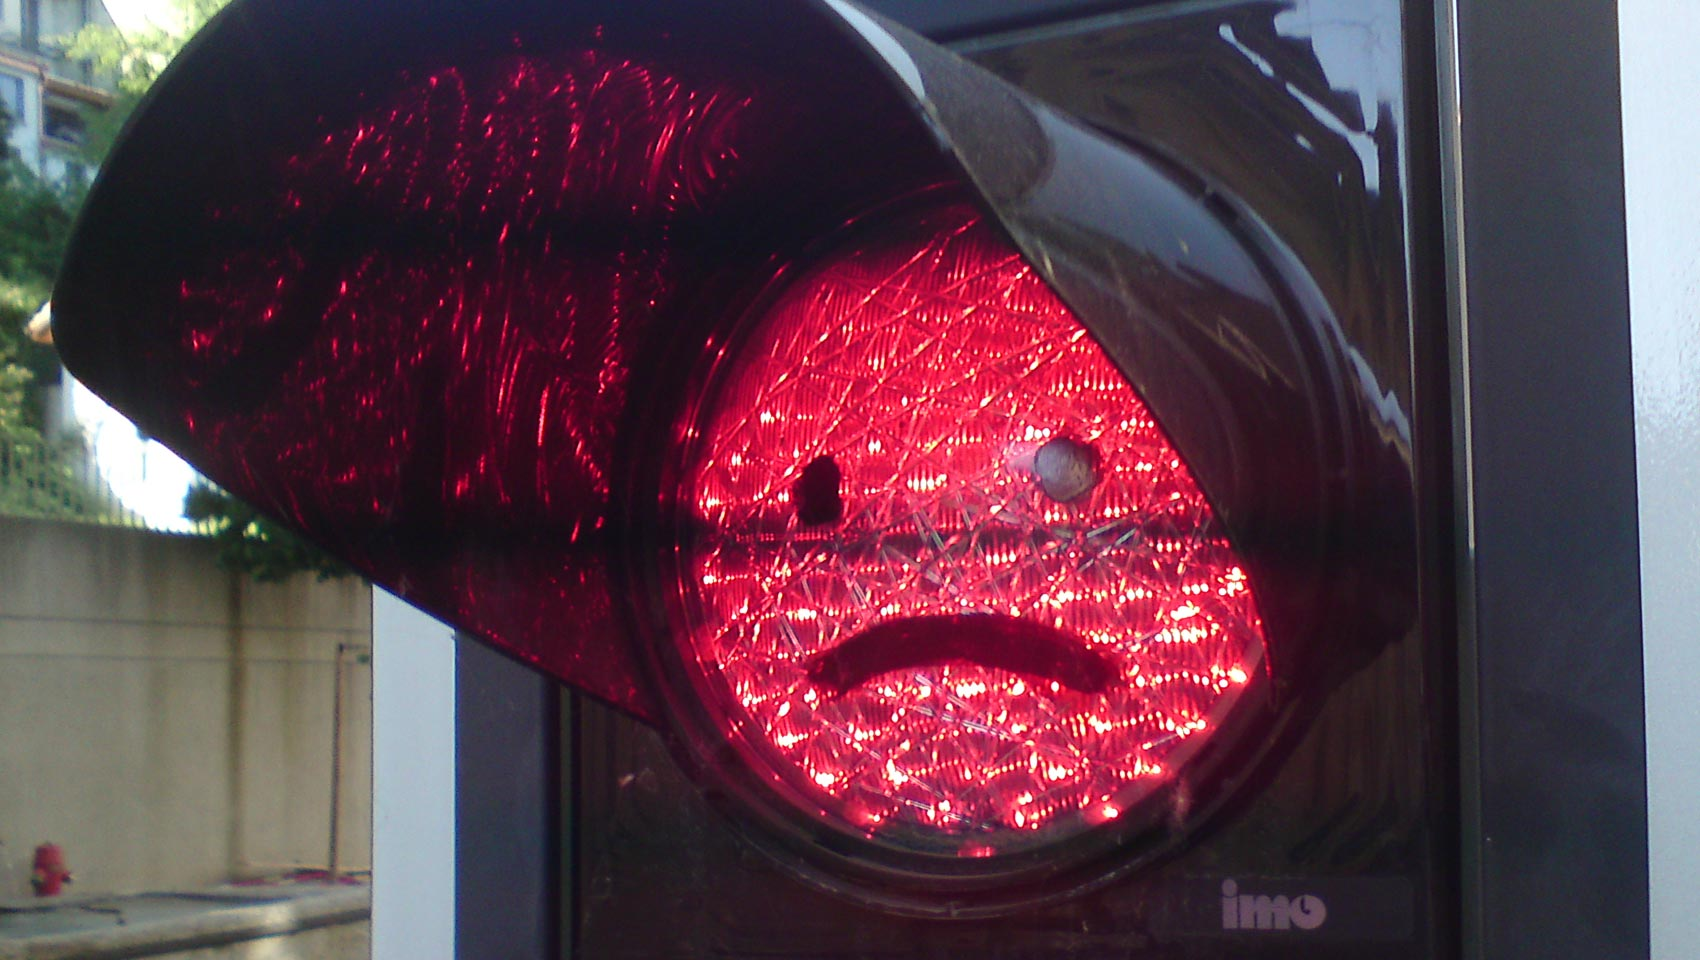 Das traurige Ampel-Smiley